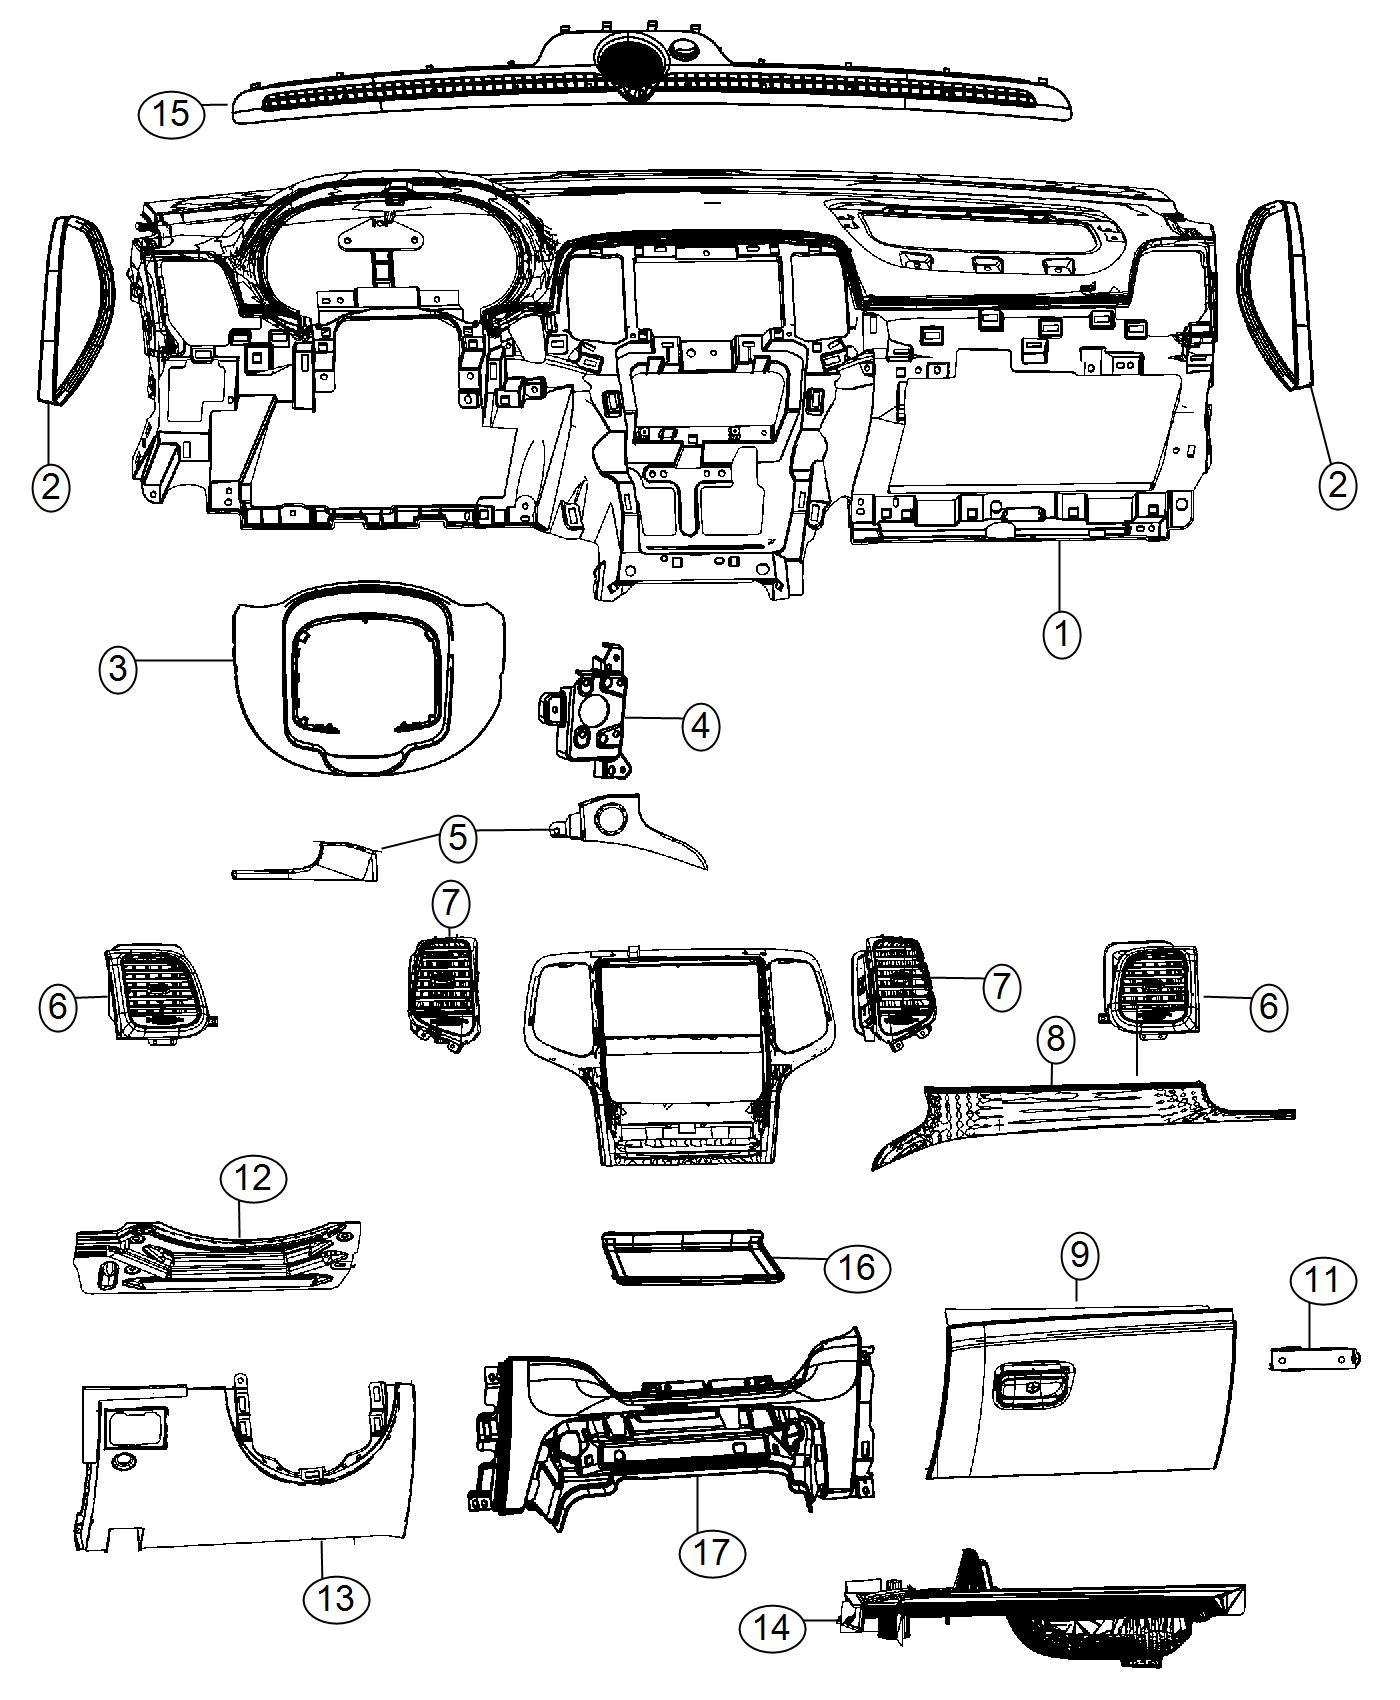 2015 Dodge Durango Bezel. Instrument panel. Lower. [-x5